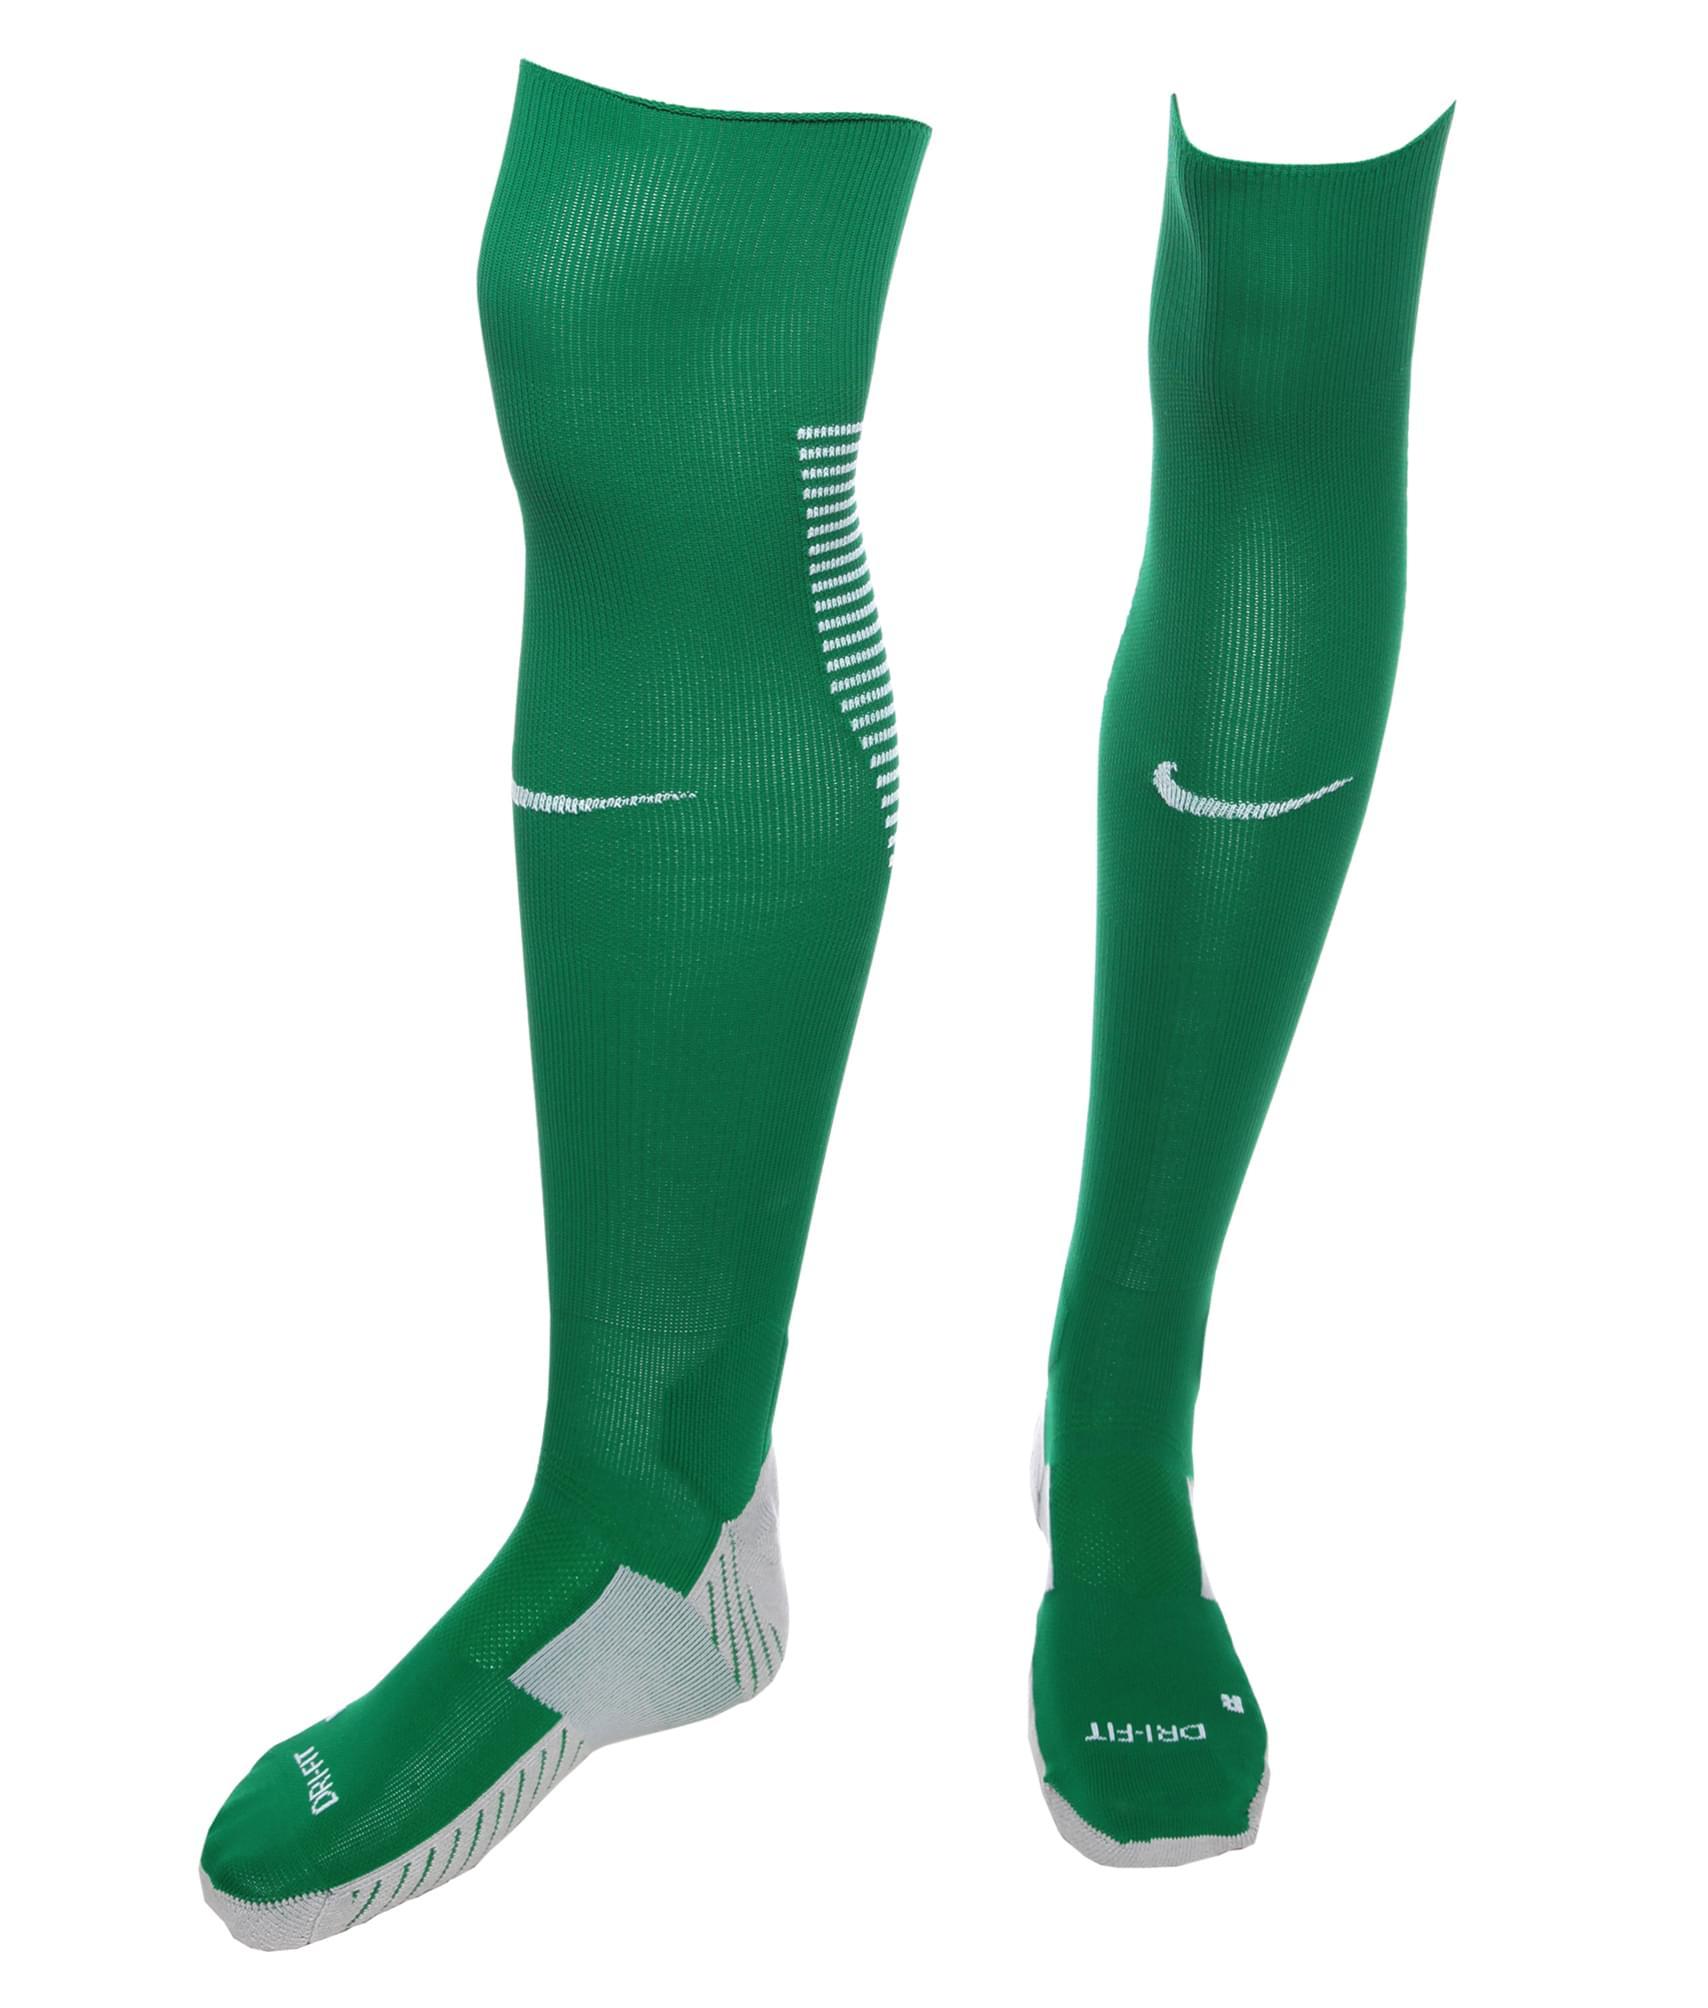 Гетры вратарские, Цвет-Зеленый, Размер-XS детские вратарские шорты цвет зеленый размер xs